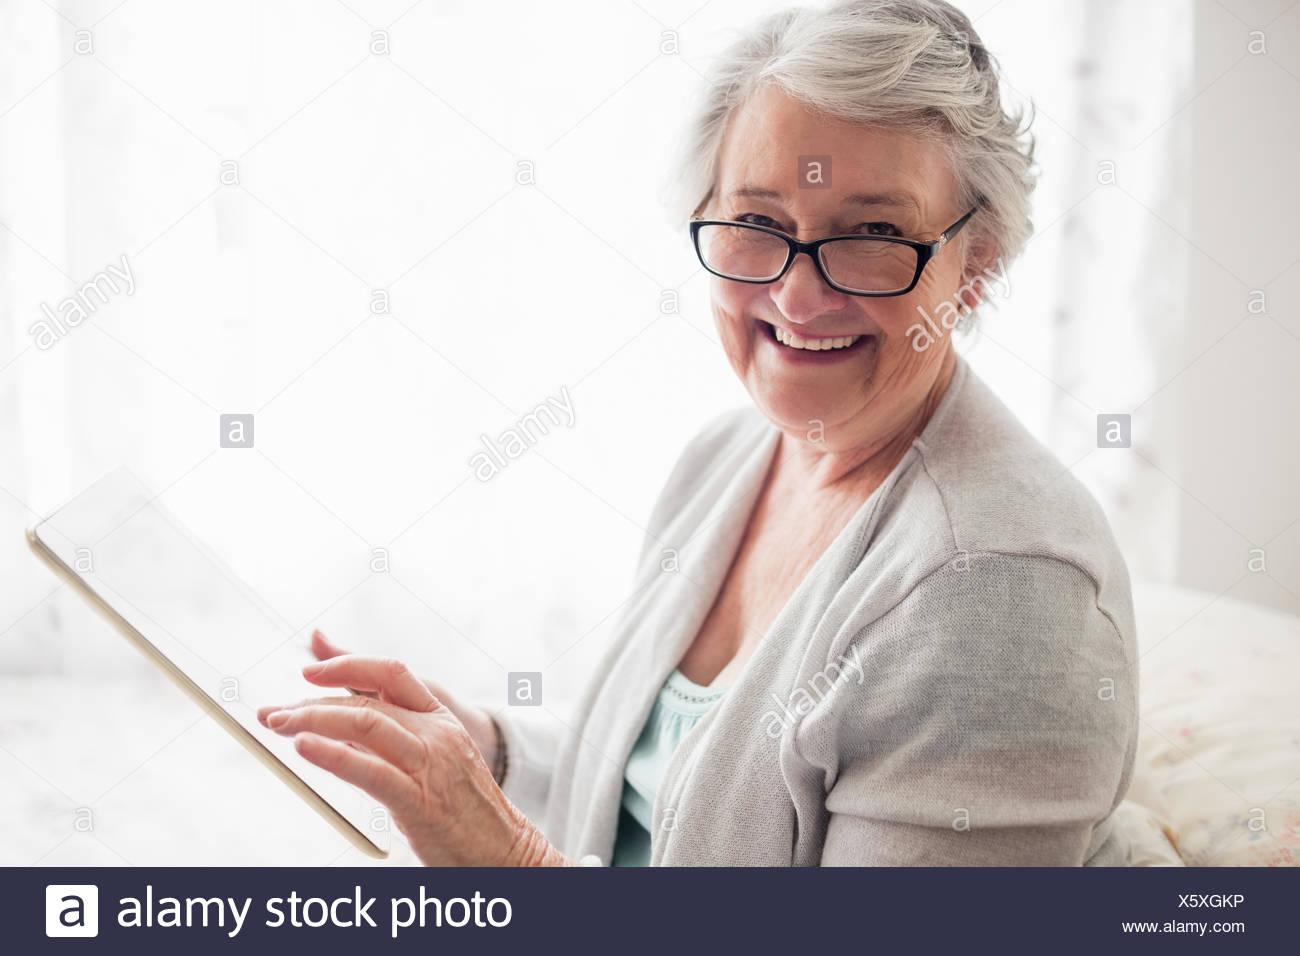 Senior woman smiling - Stock Image